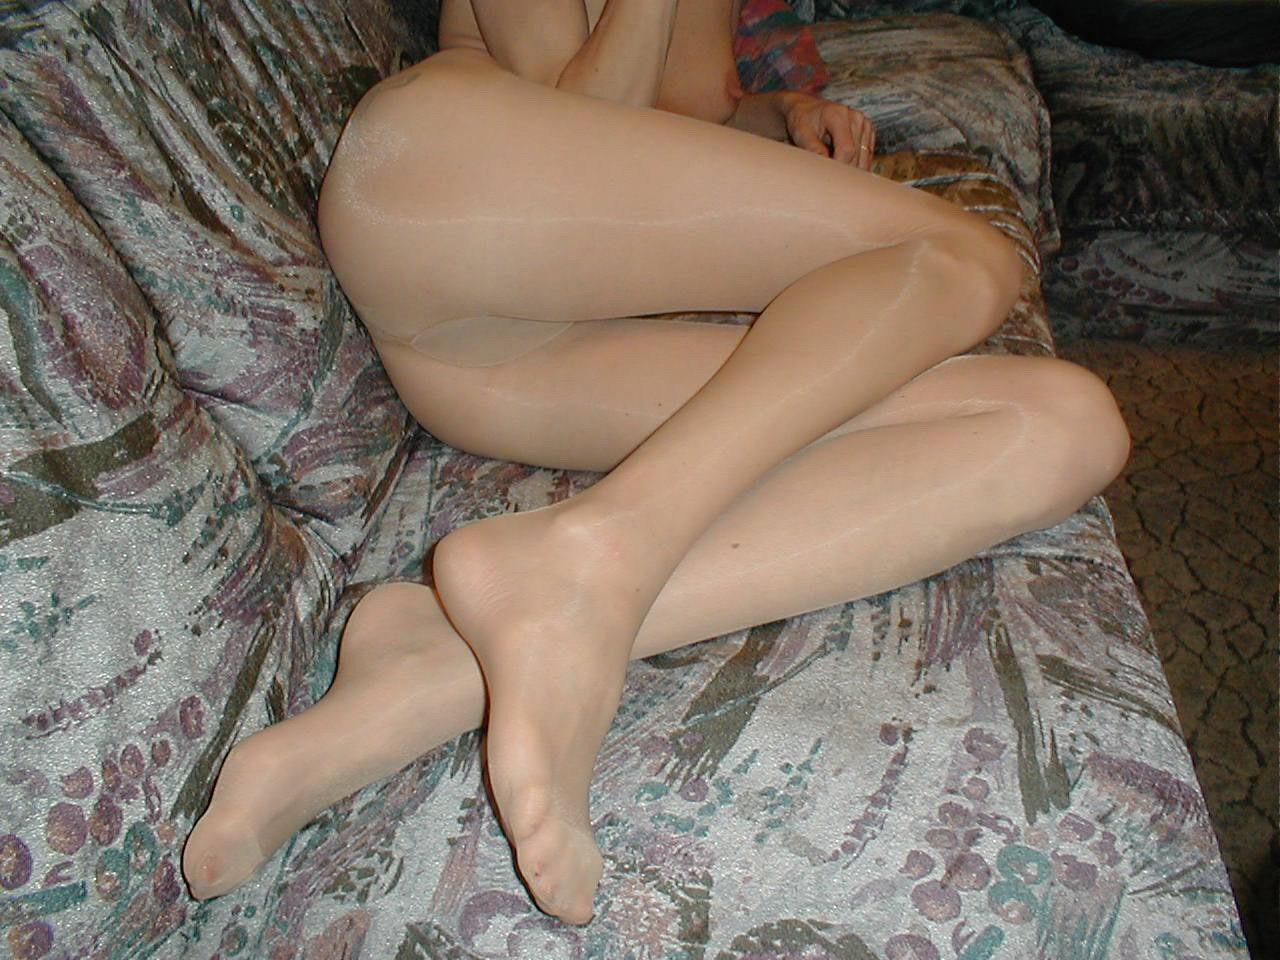 http://pbs-2.adult-empire.com/85/8570/020/pic/3.jpg